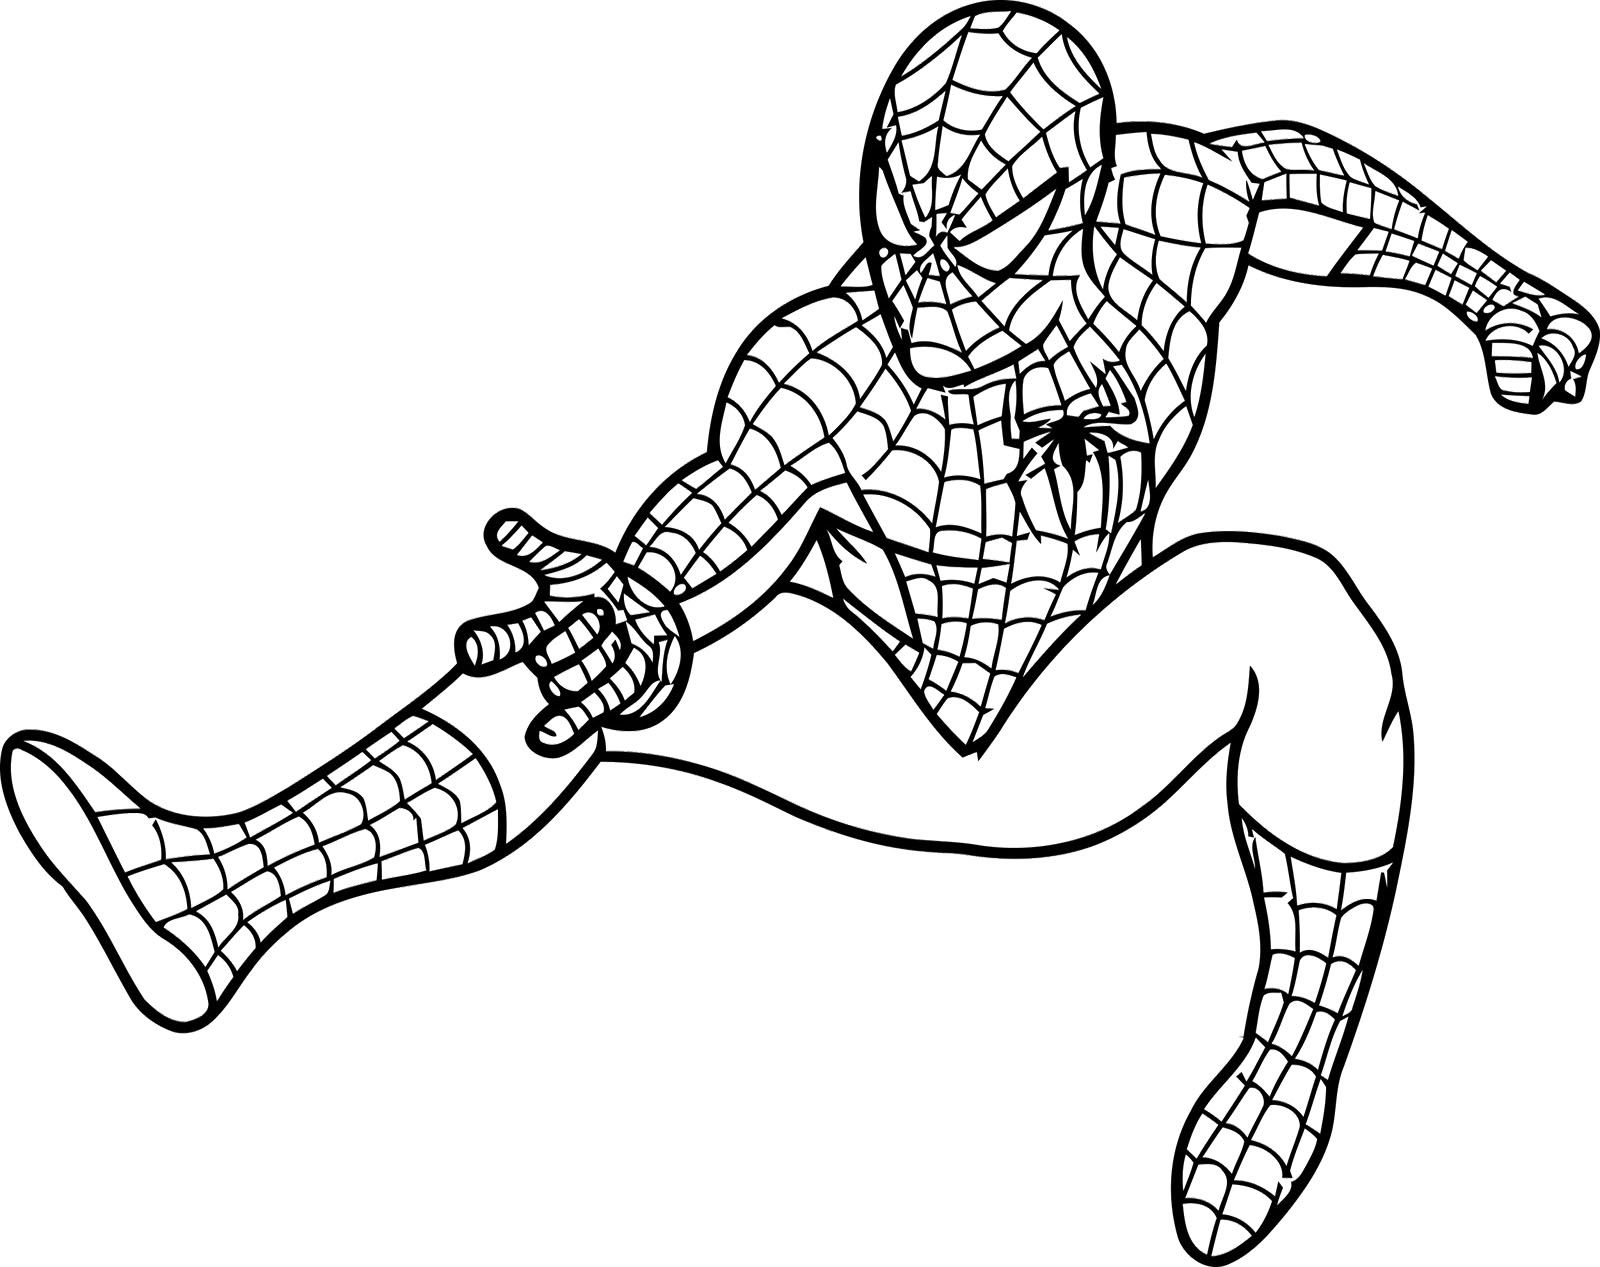 Spiderman spider man black and white clipart clipartfest 2.